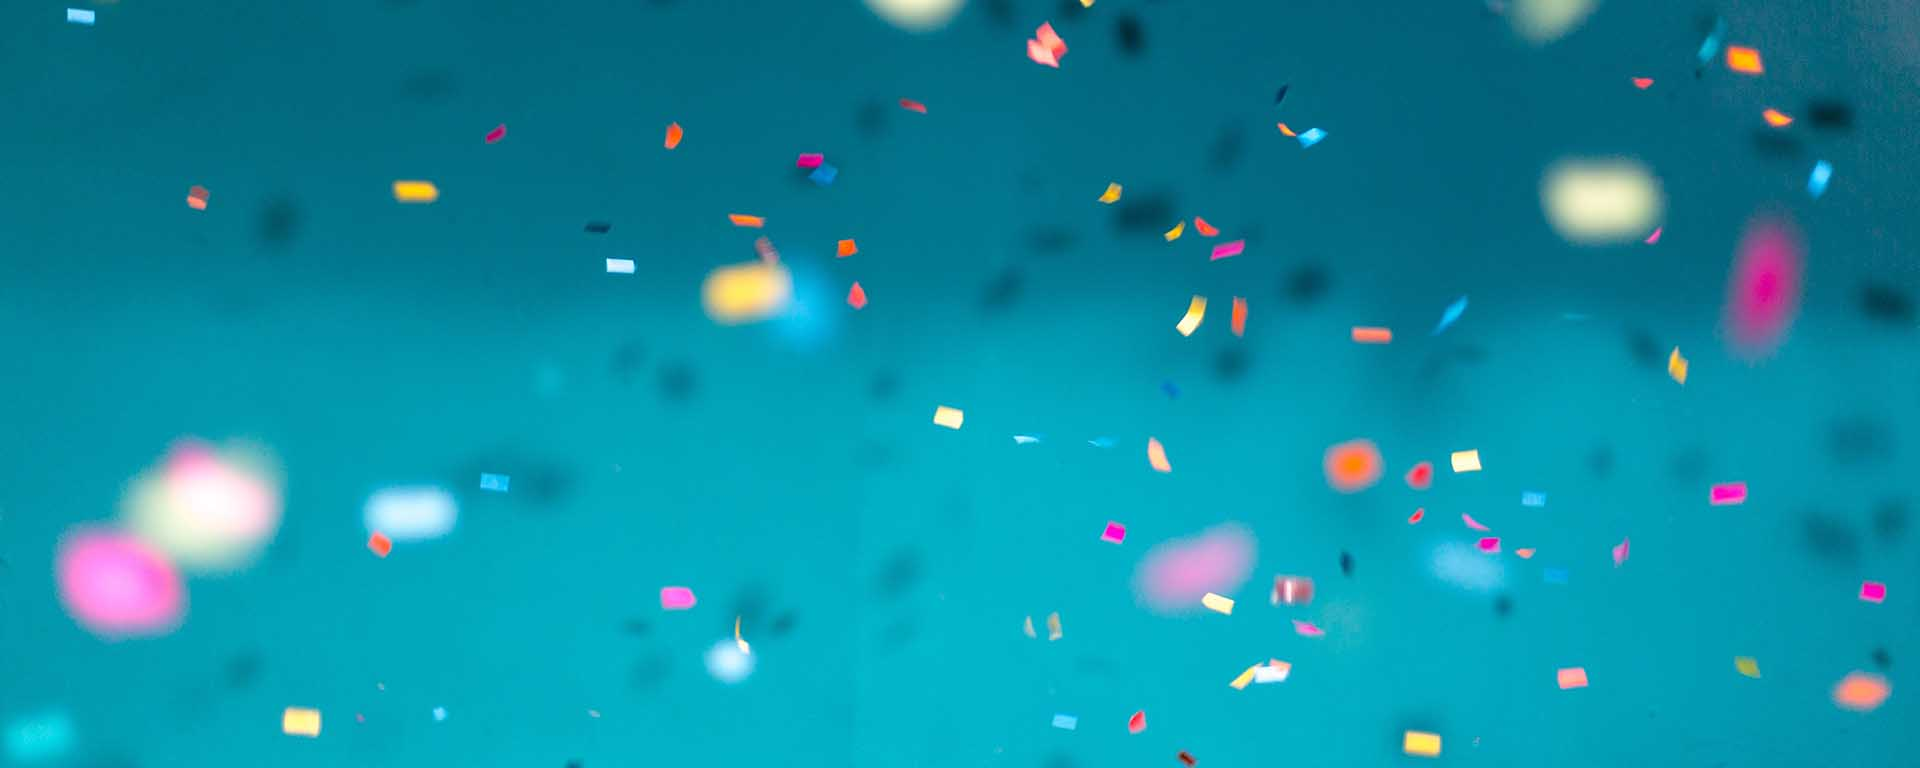 Confetti against a blue background